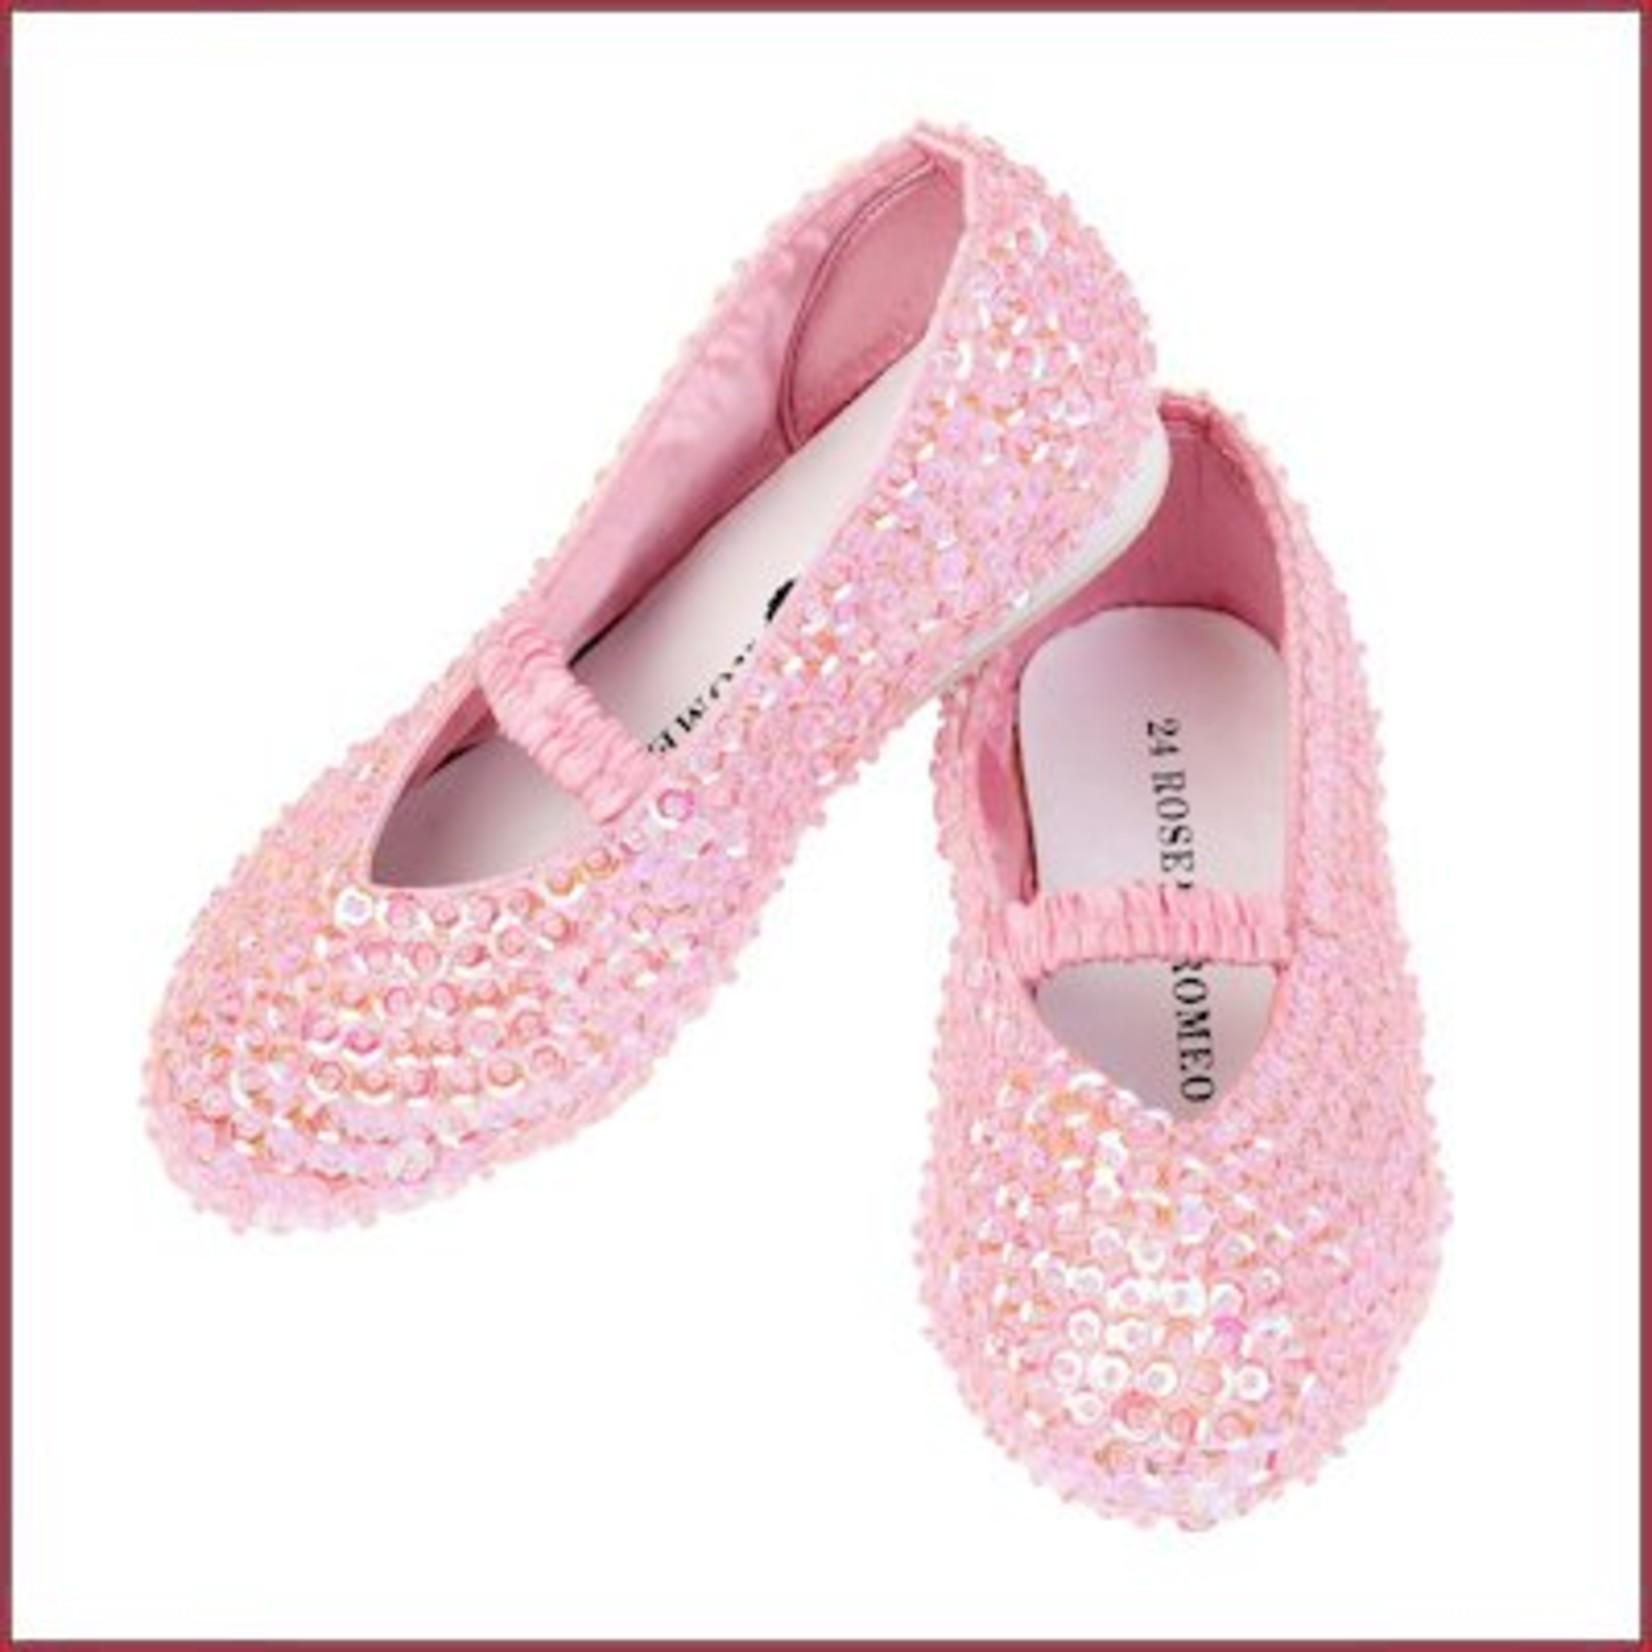 Souza for kids Schoen Lily, roze pailletten